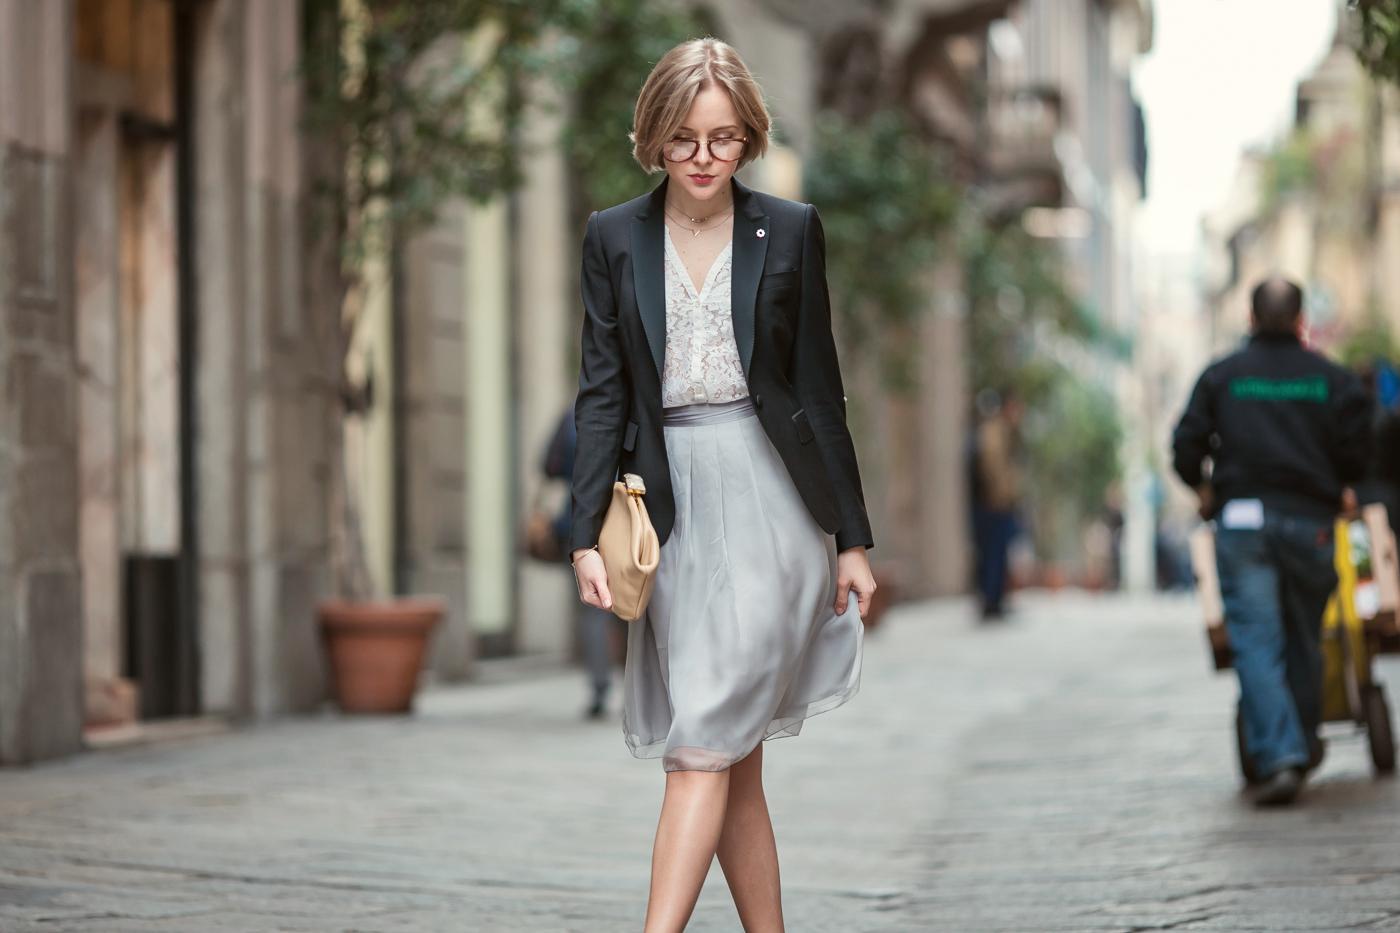 darya kamalova from thecablook com on lardini presentation in Milan and in attila showroom wearing lardini perfect black jacket with marni retro clutch and sophia webster kitten heels-22 copy